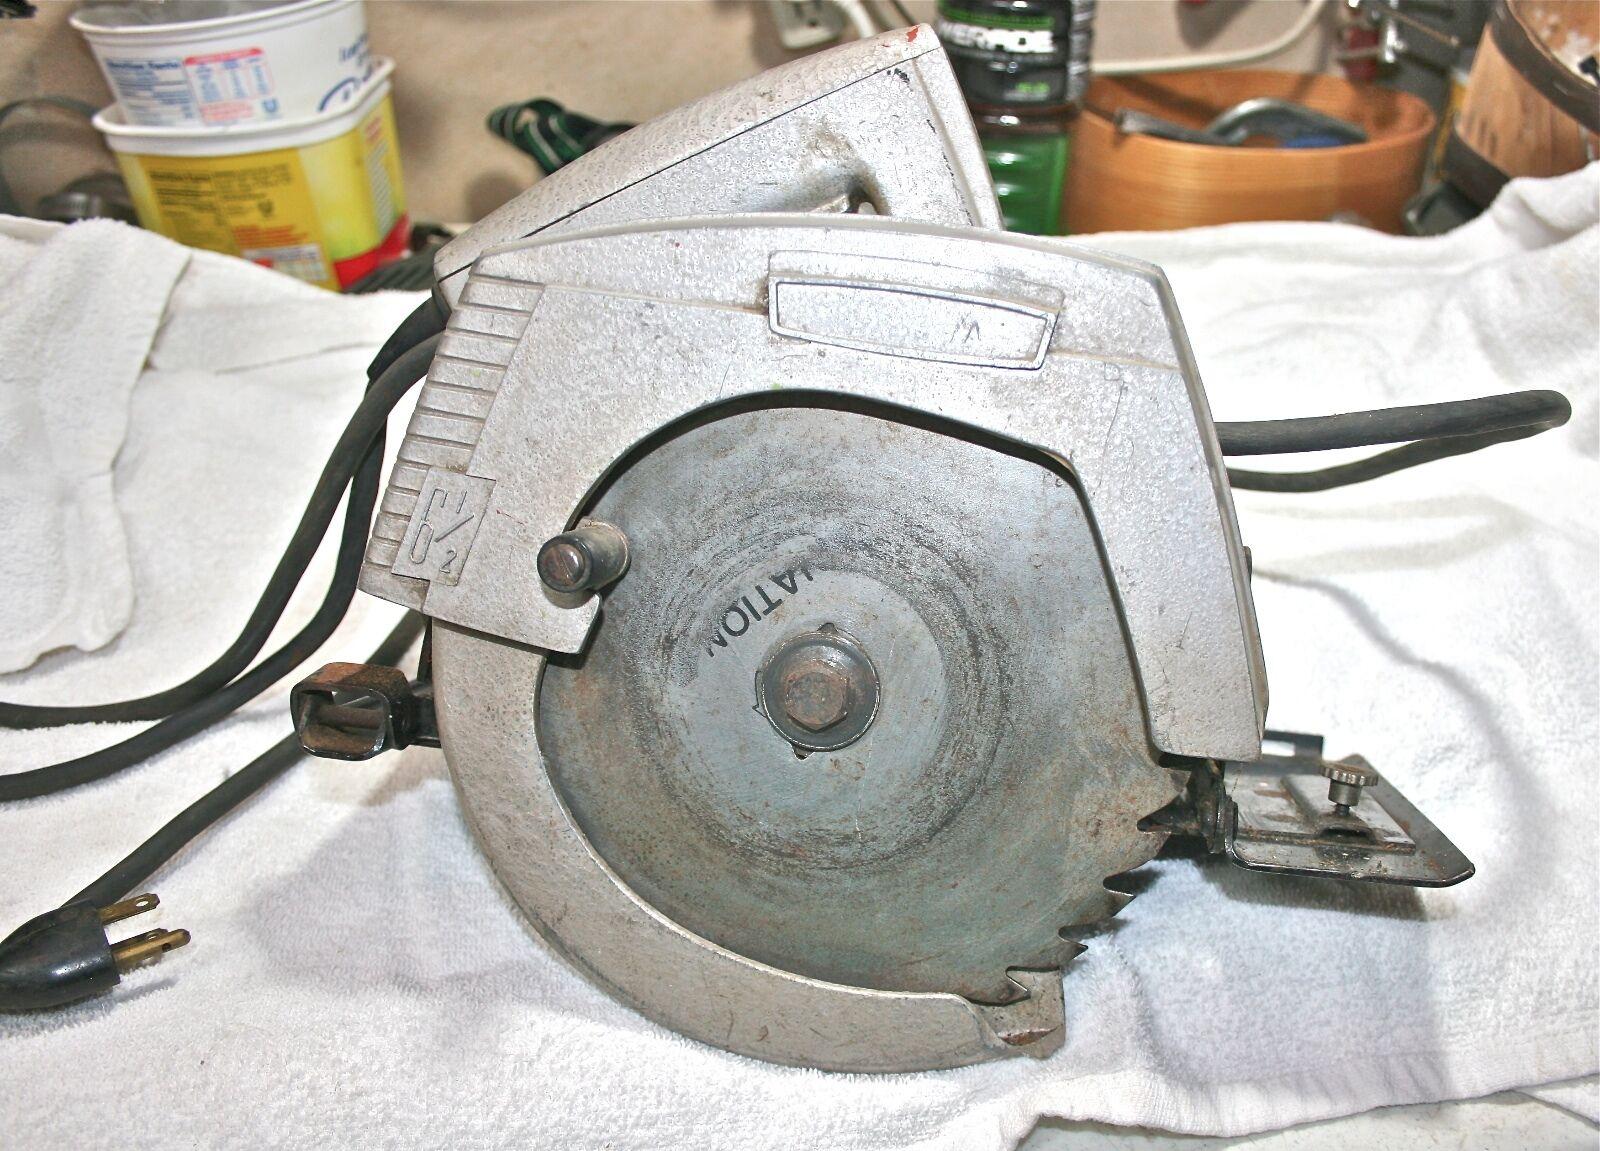 Vintage Simpson Sears 6 1/2'' power saw